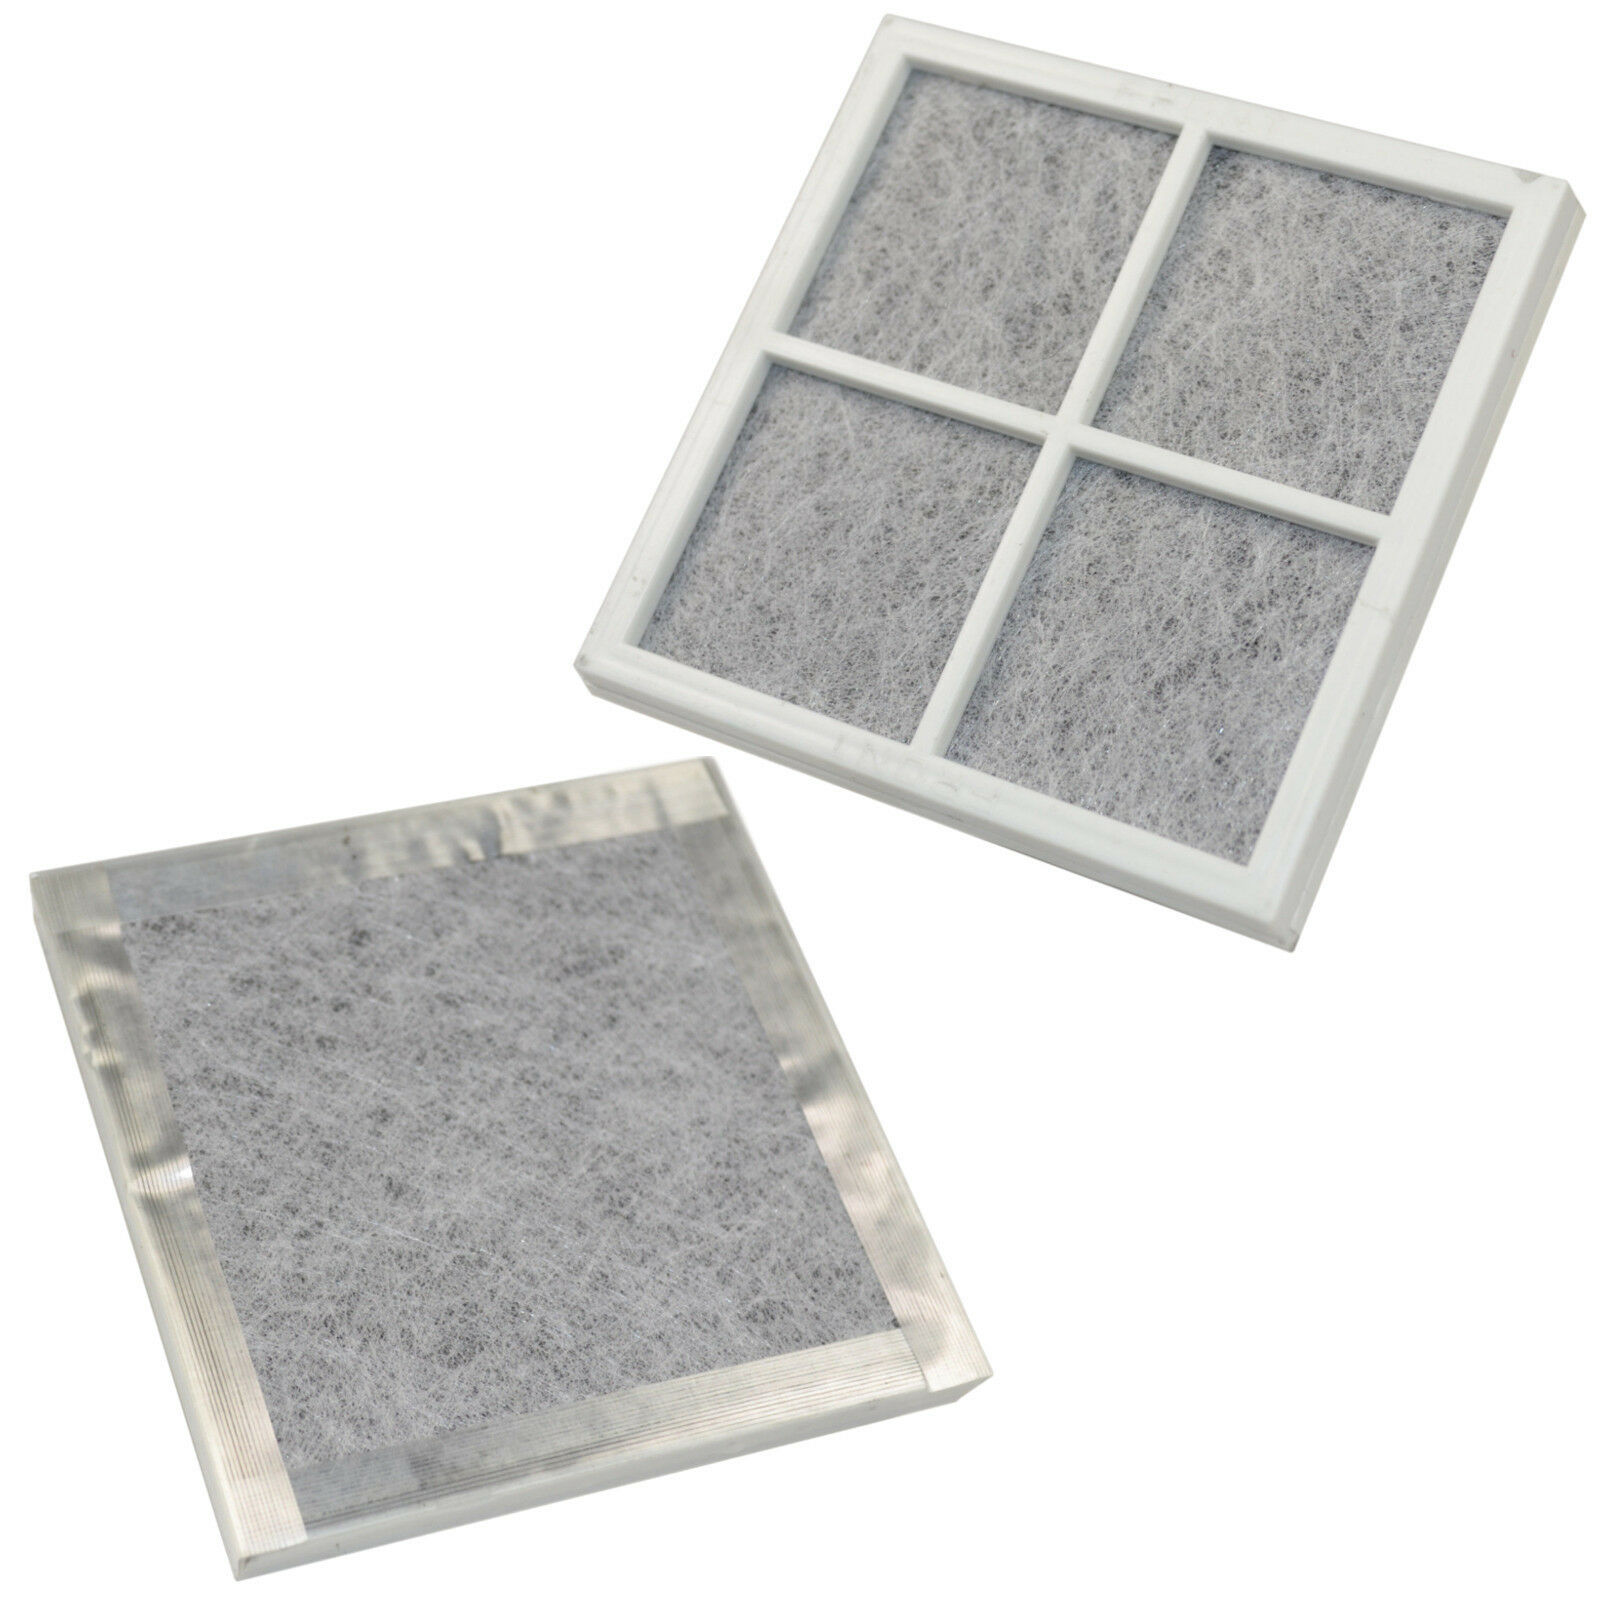 Filtro aria per LG Electronis Pure/'N/'Fresh LFX25991ST LFX25991ST